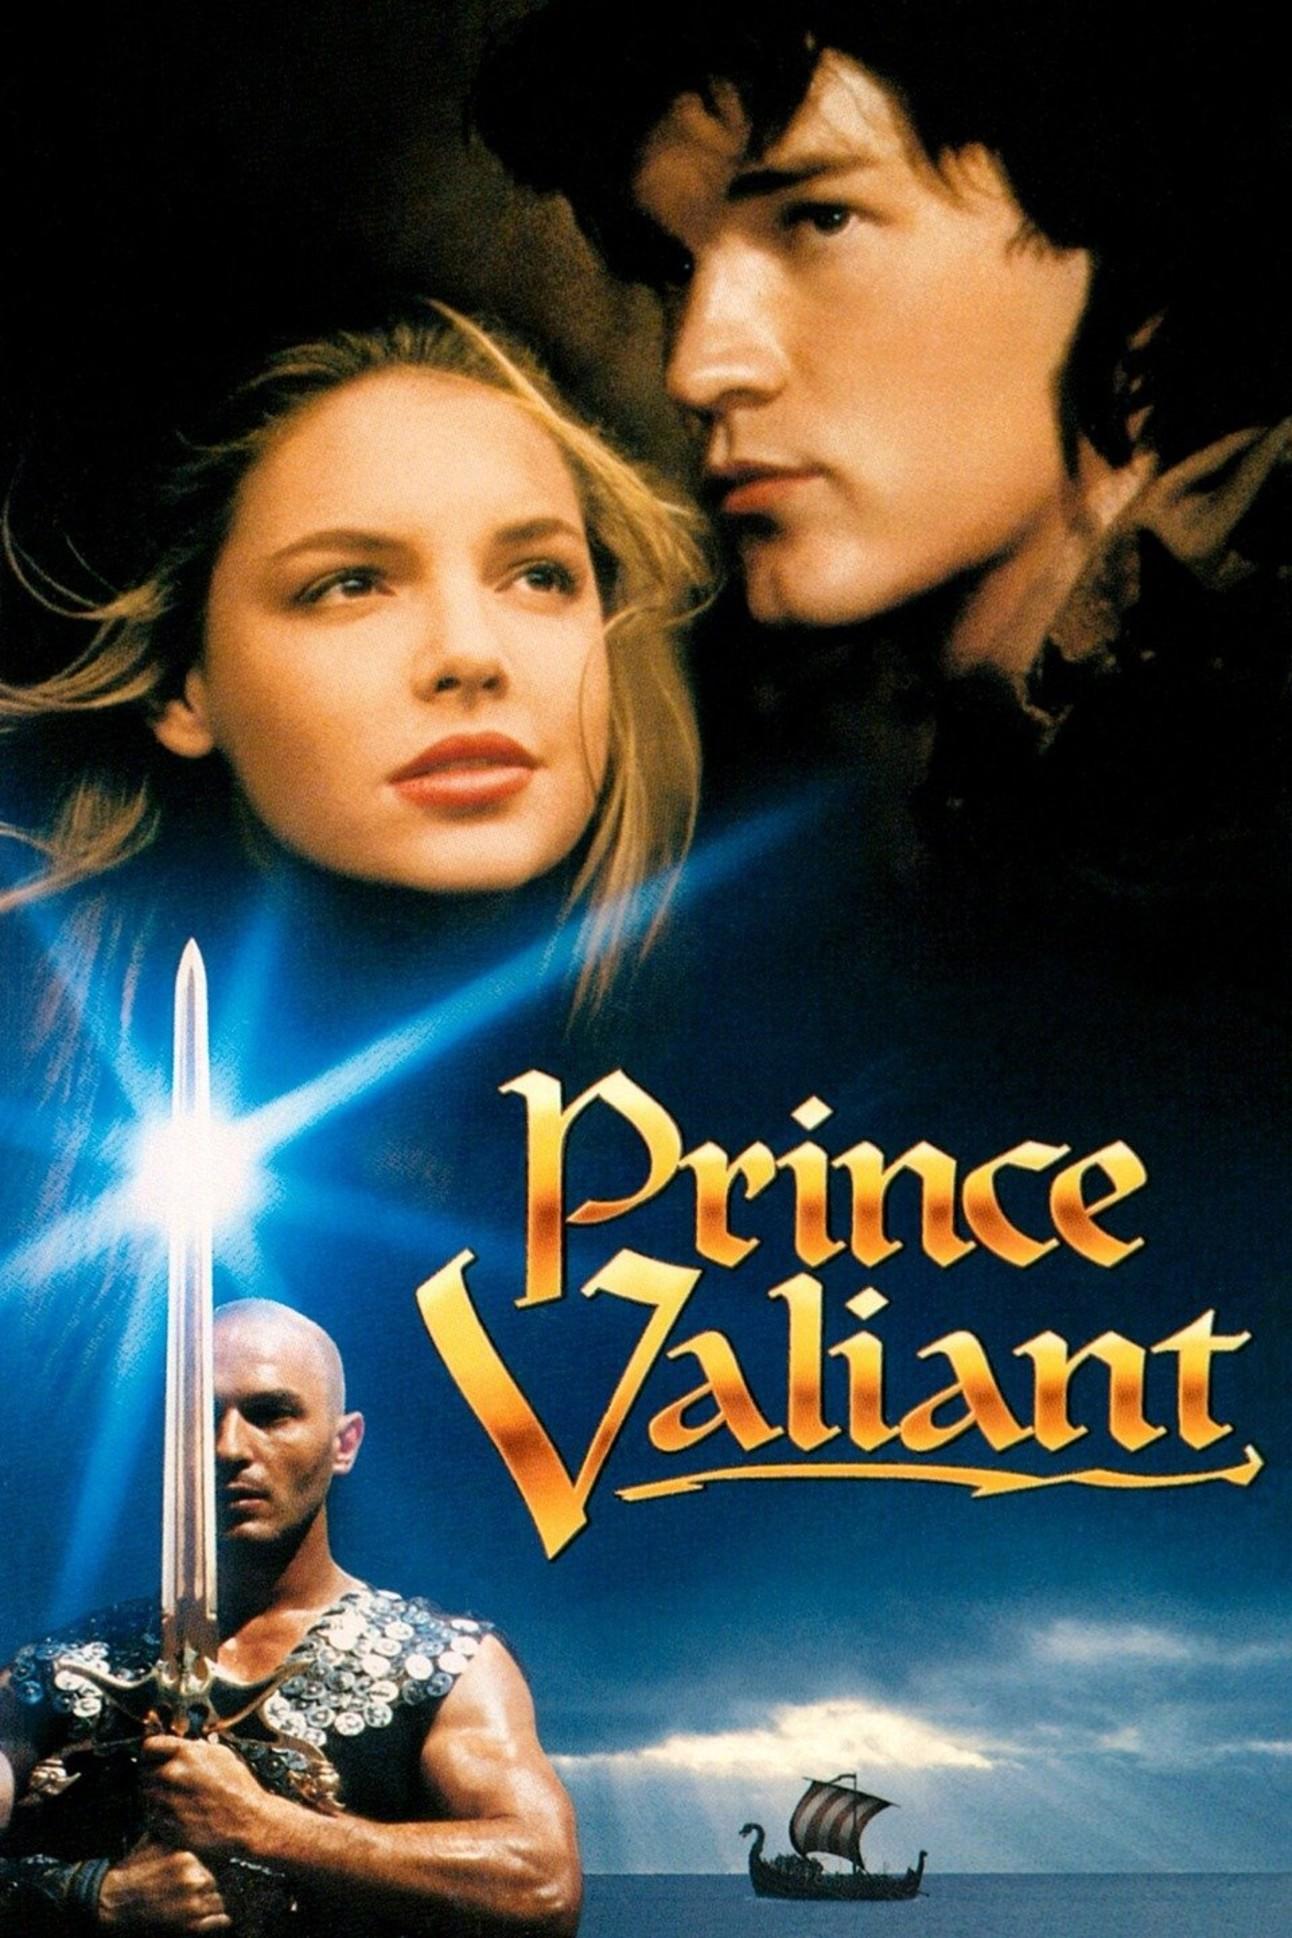 prince-valiant.jpg